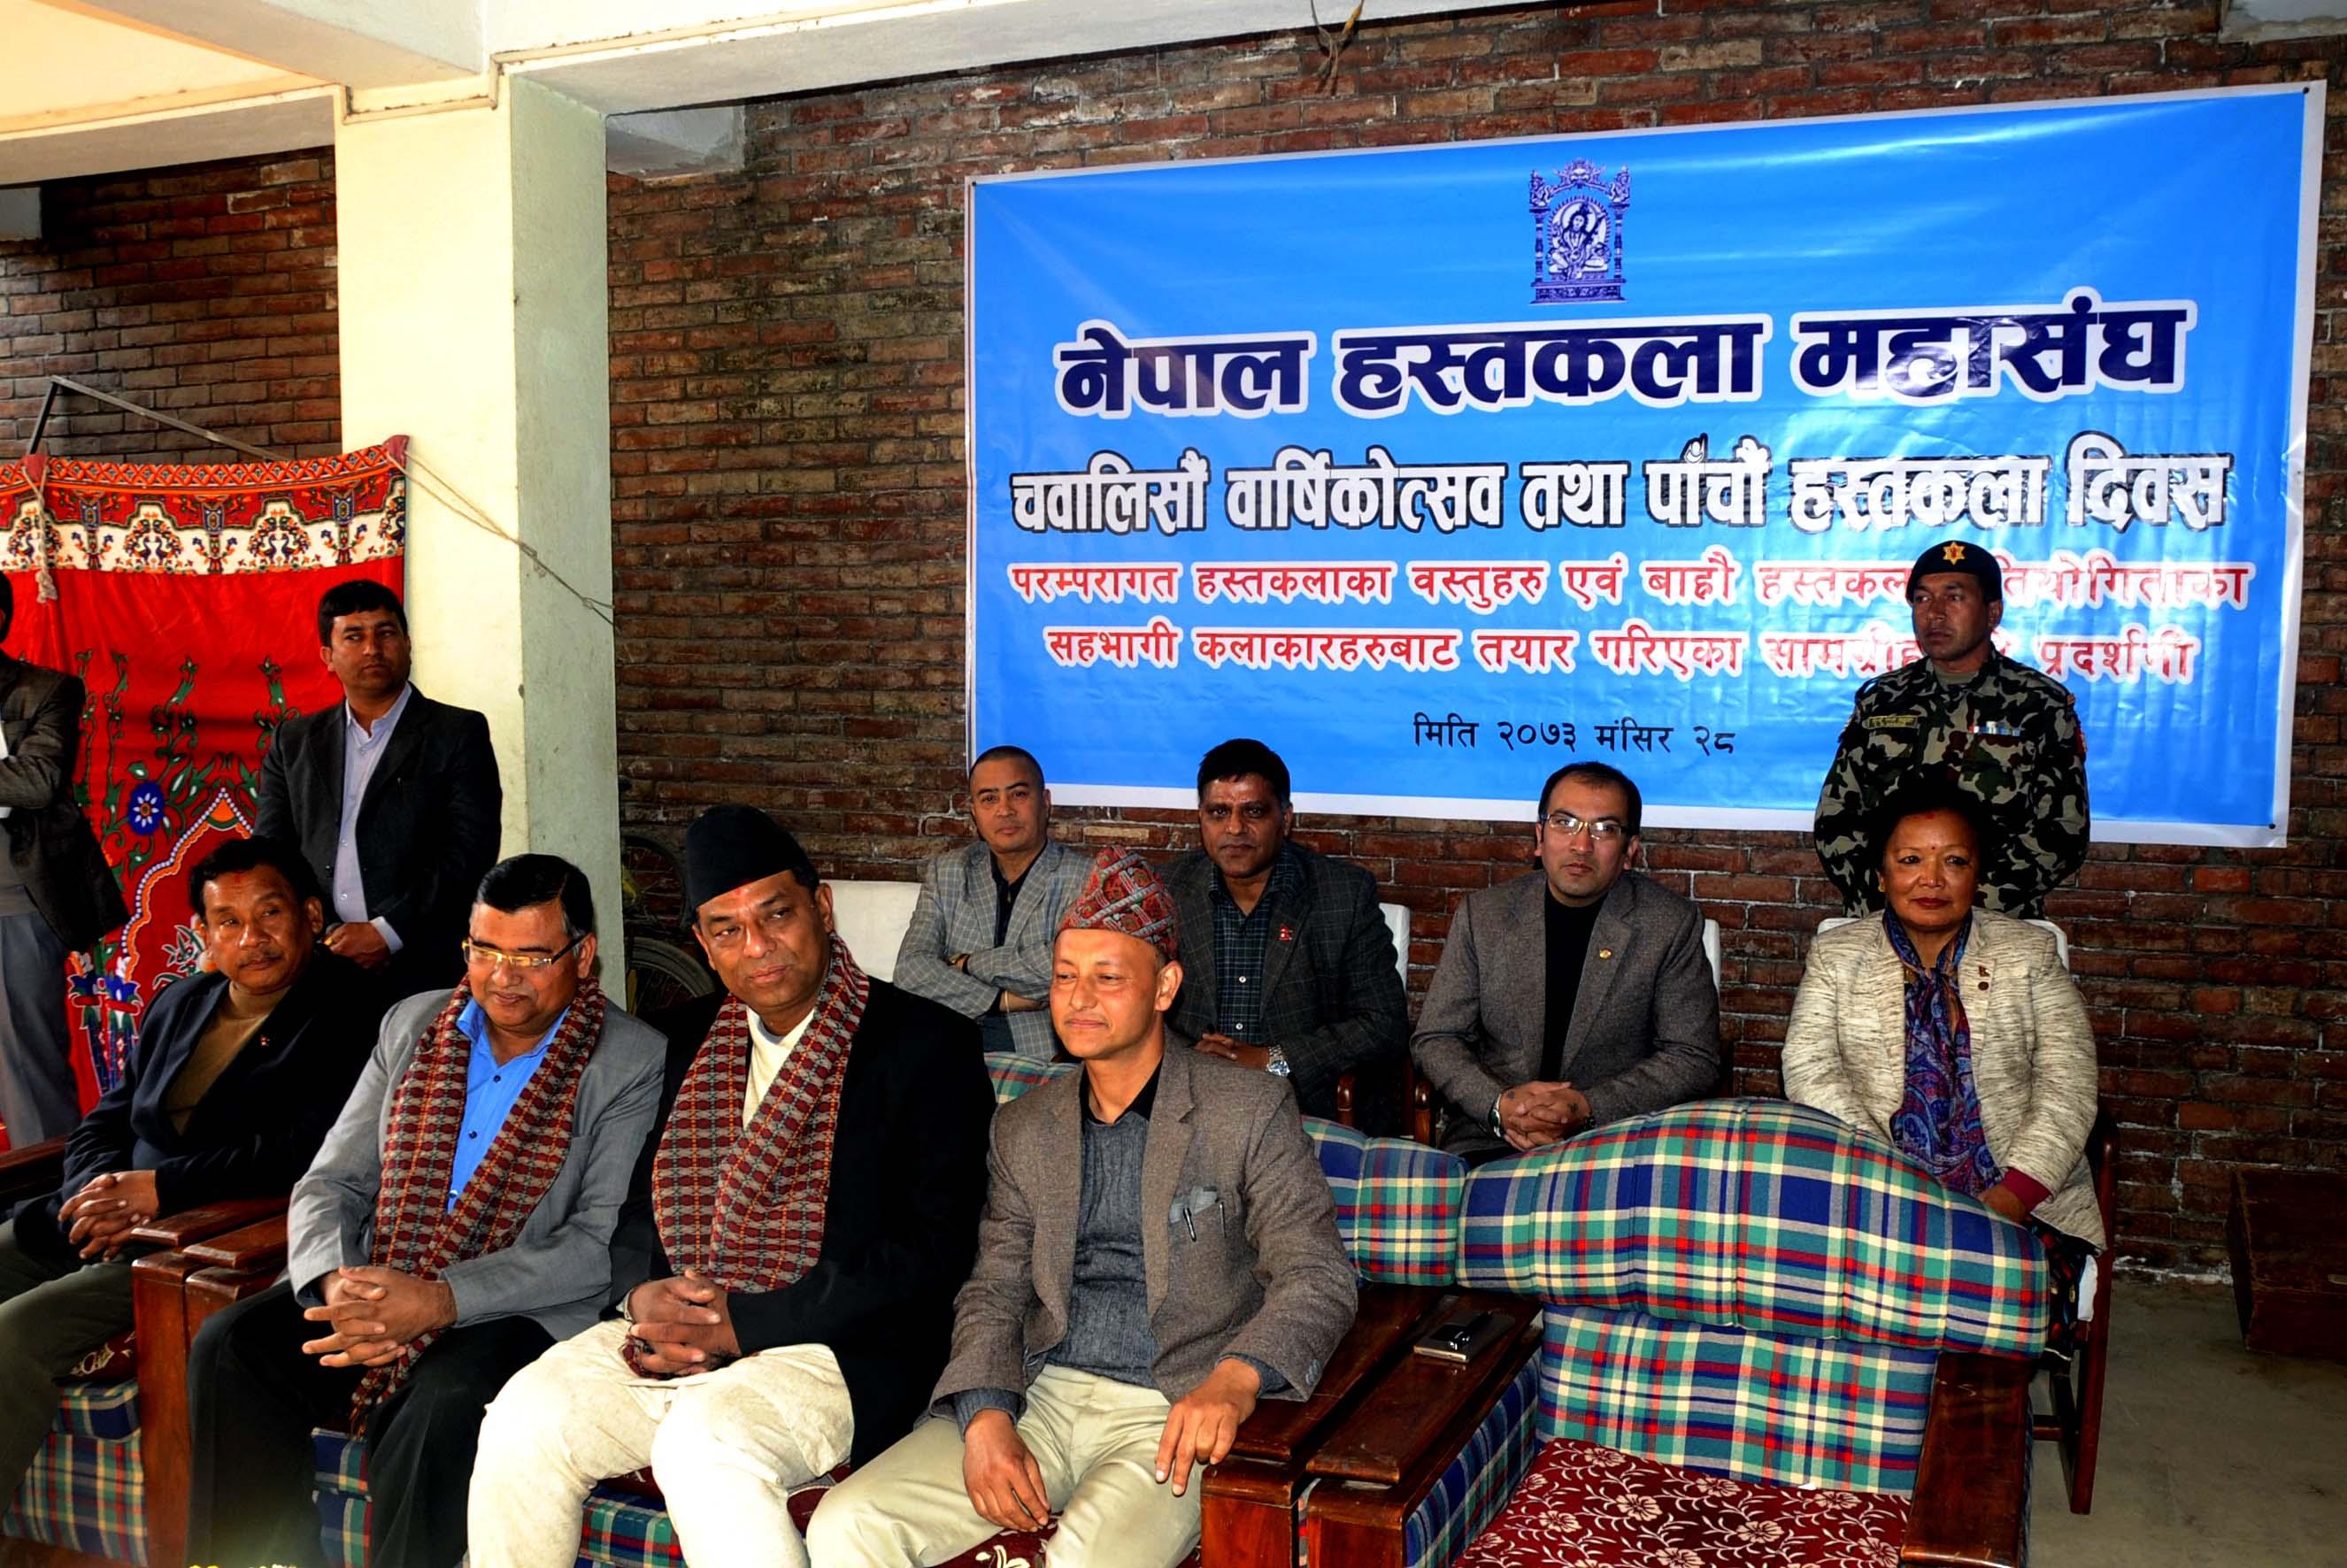 नेपाल हस्तकला महासंघको चौवालिसौं वार्षिकोत्सव सम्पन्न